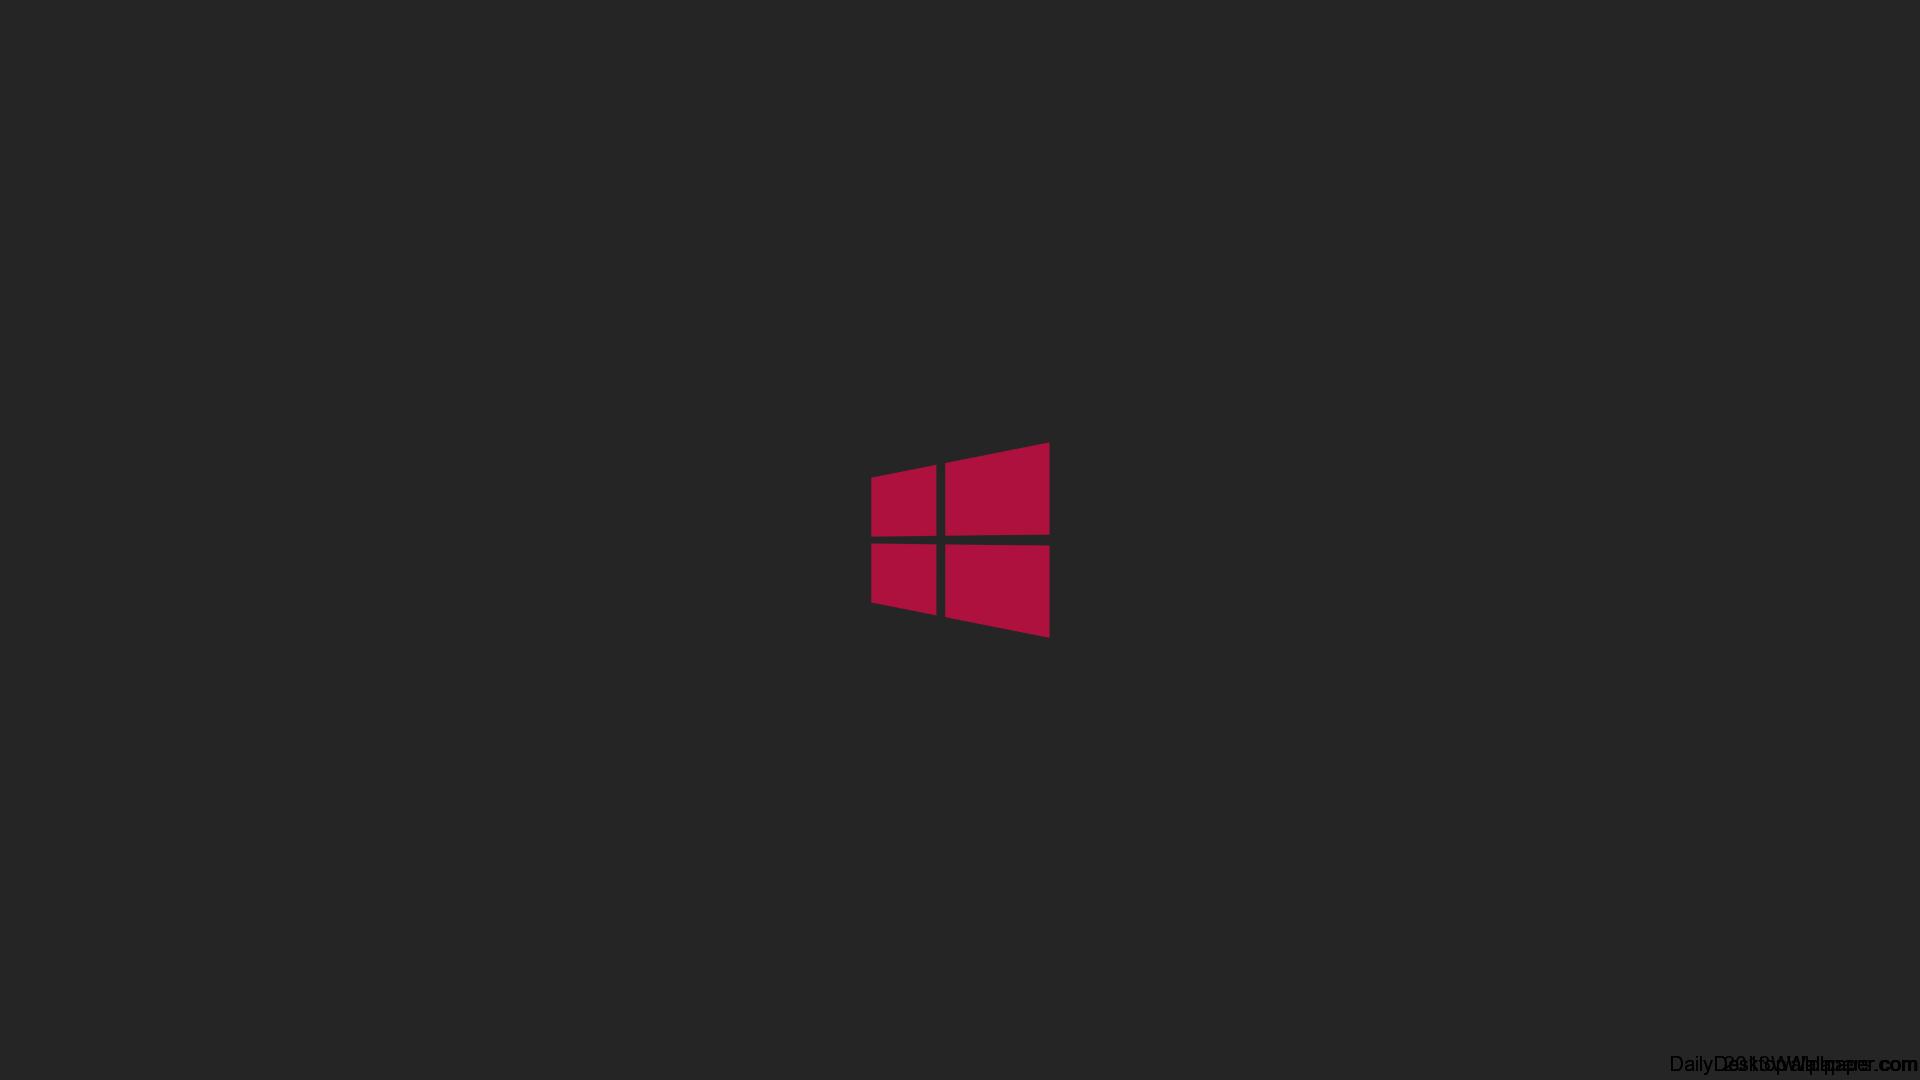 Download purple windows 8 logo wallpaper HD wallpaper 1920x1080